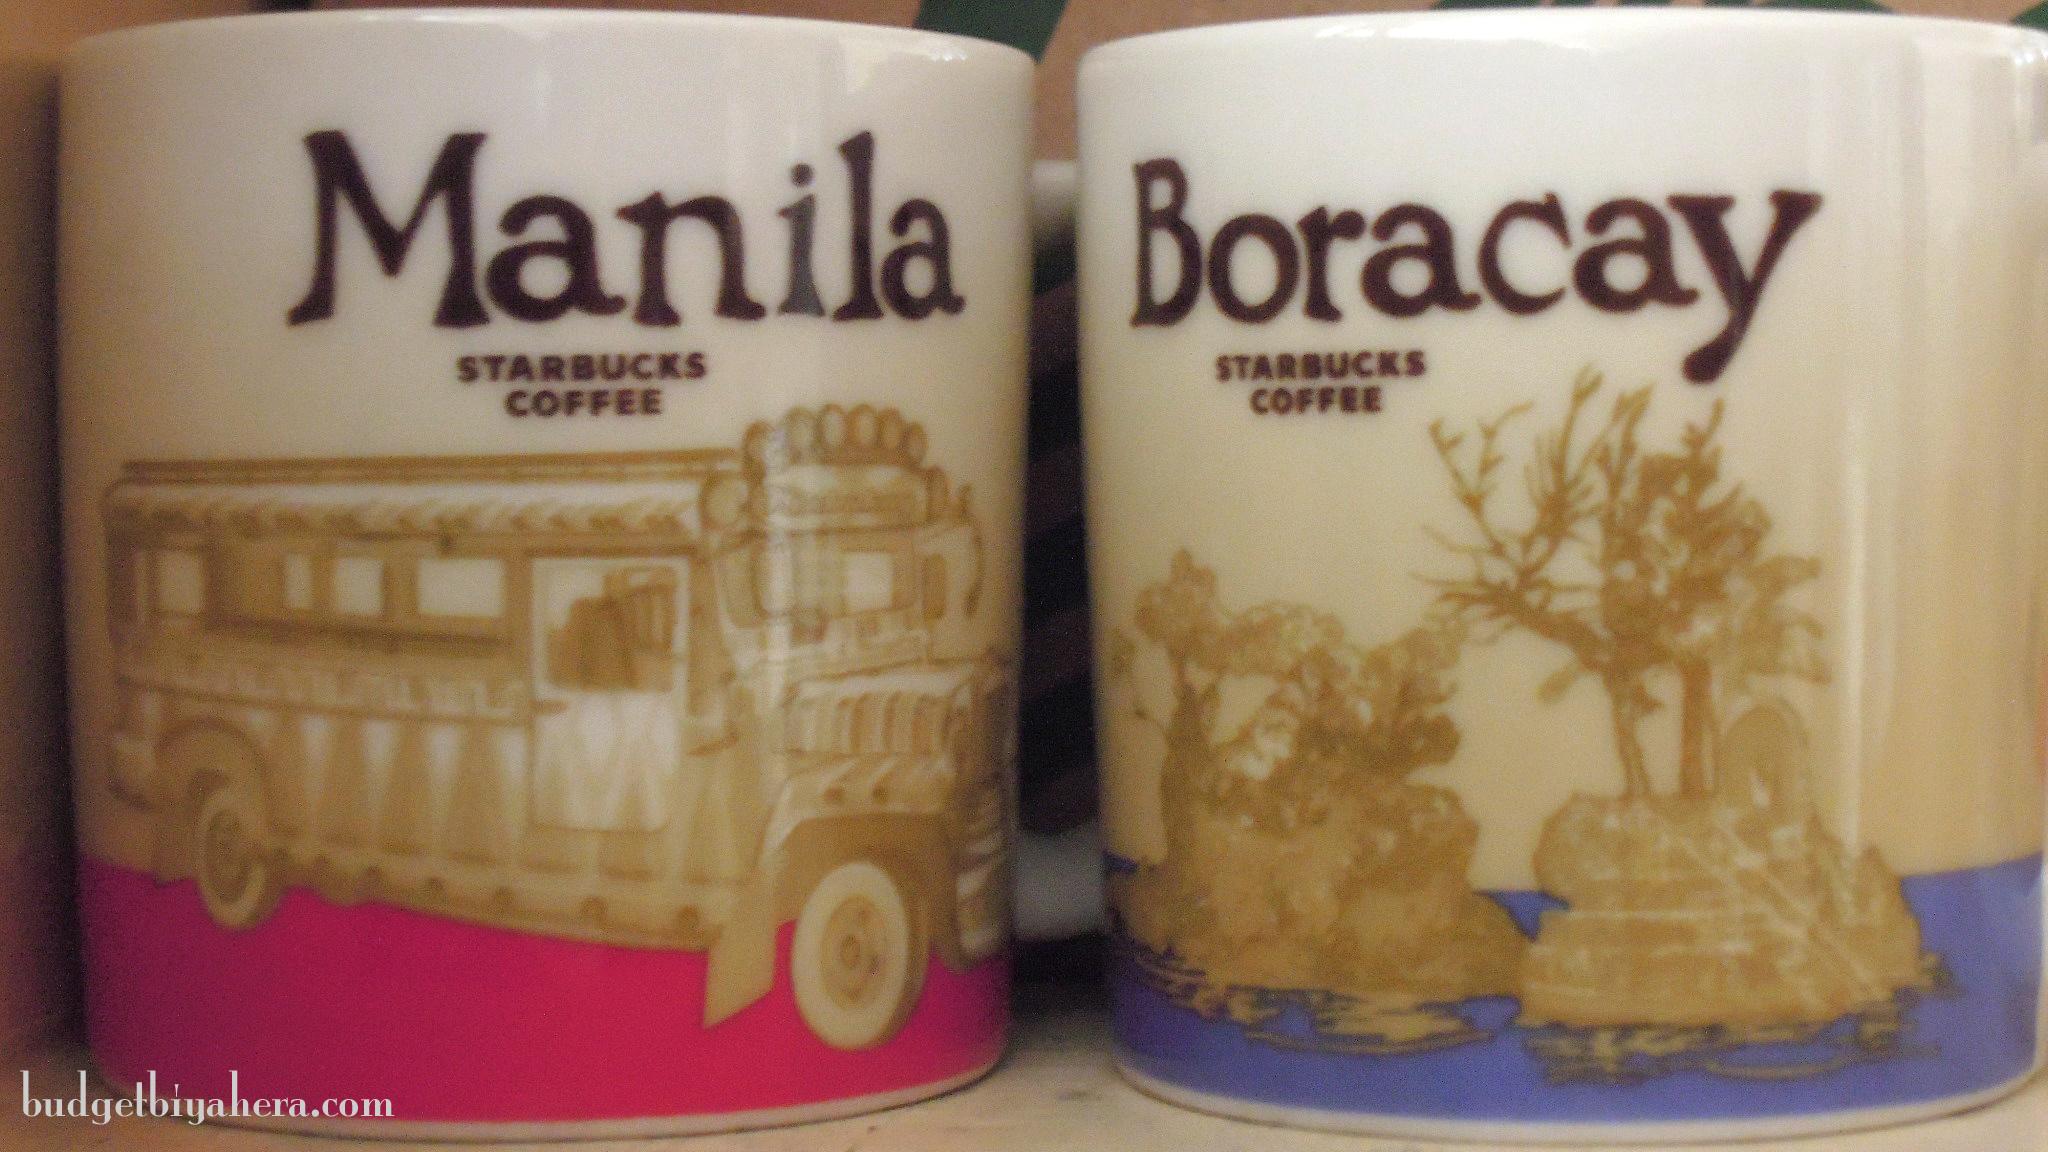 MNL_Boracay